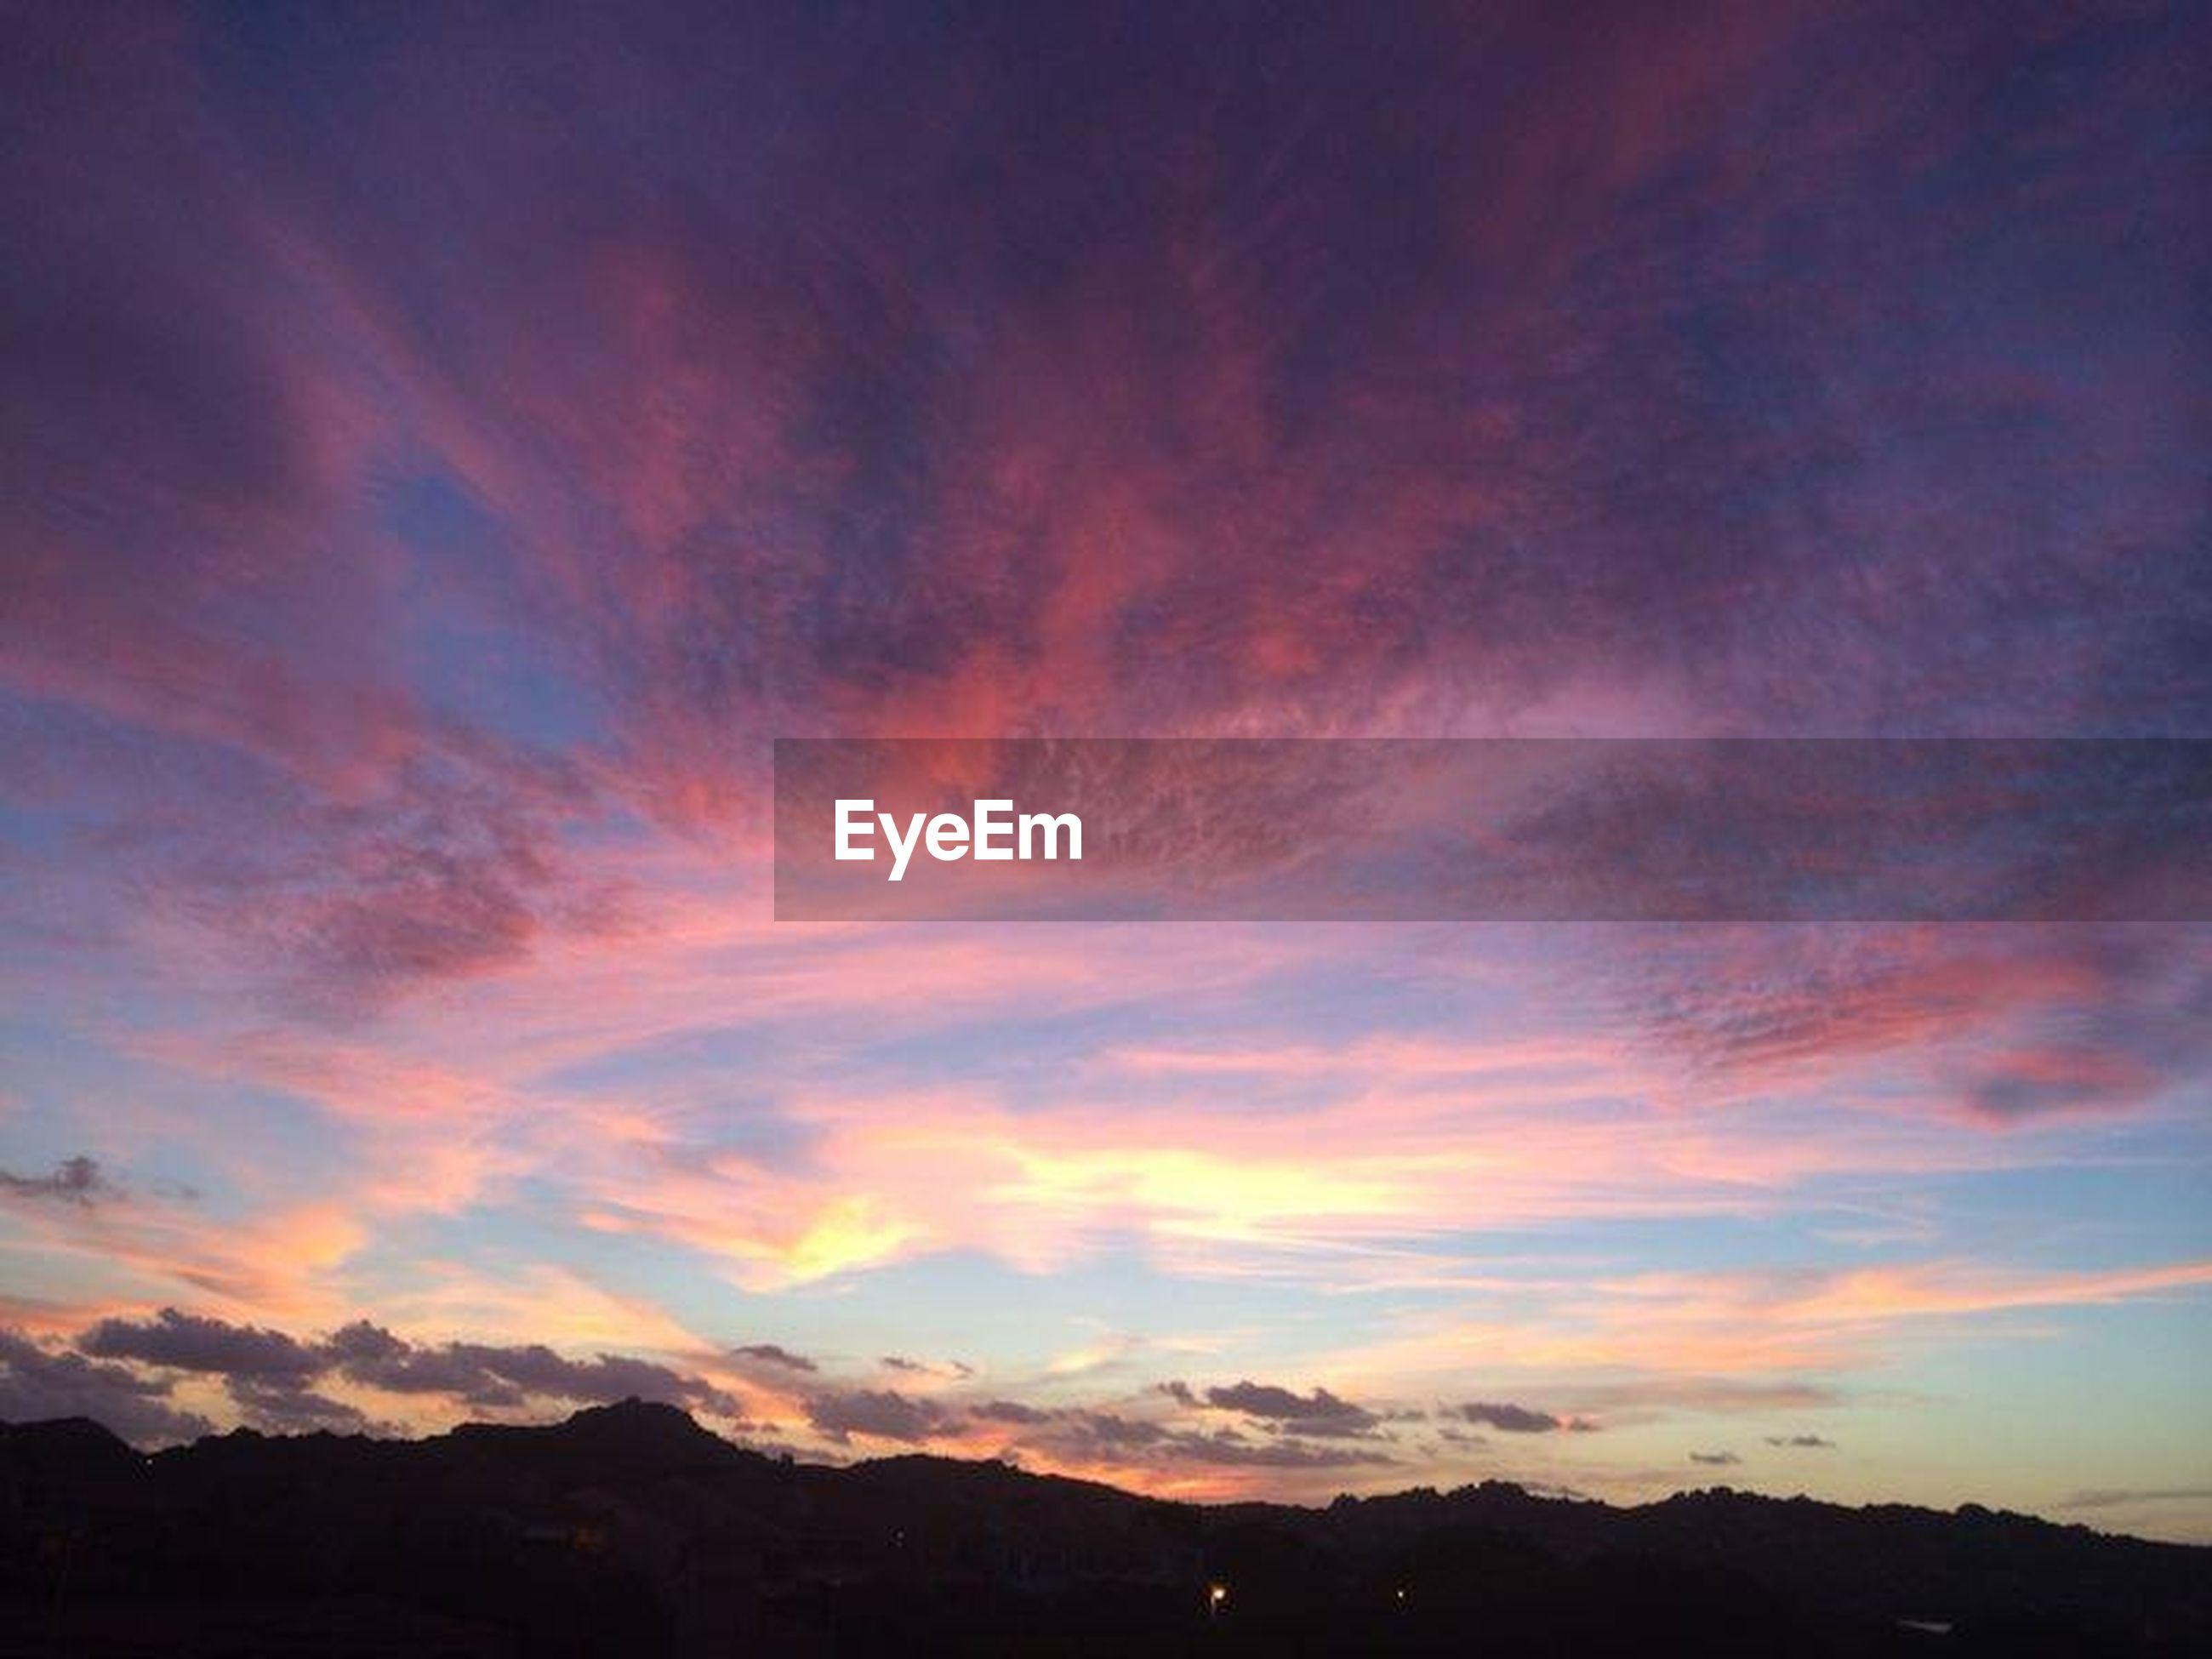 scenics, sky, sunset, tranquil scene, mountain, beauty in nature, tranquility, cloud - sky, silhouette, nature, landscape, mountain range, idyllic, orange color, dramatic sky, cloud, cloudy, majestic, non-urban scene, dusk